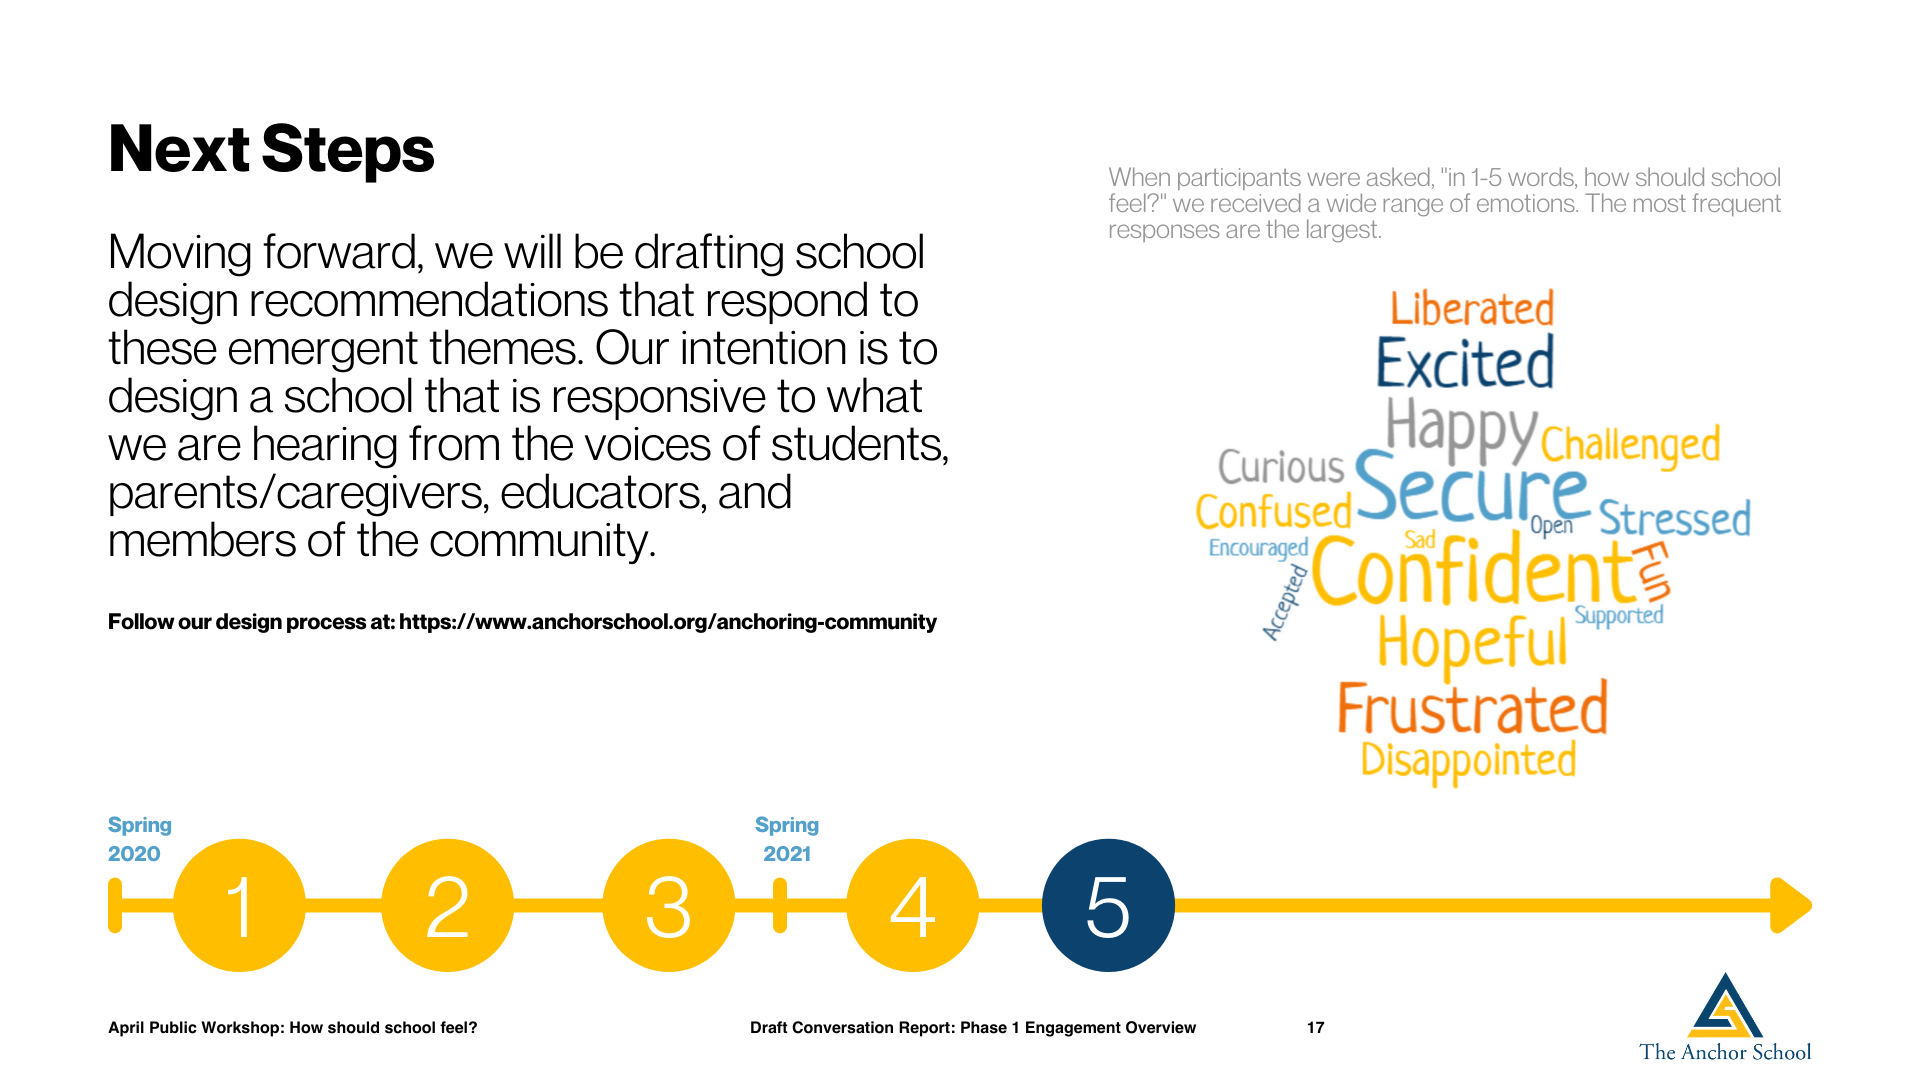 Public Workshop Series School Design The Anchor School (16)